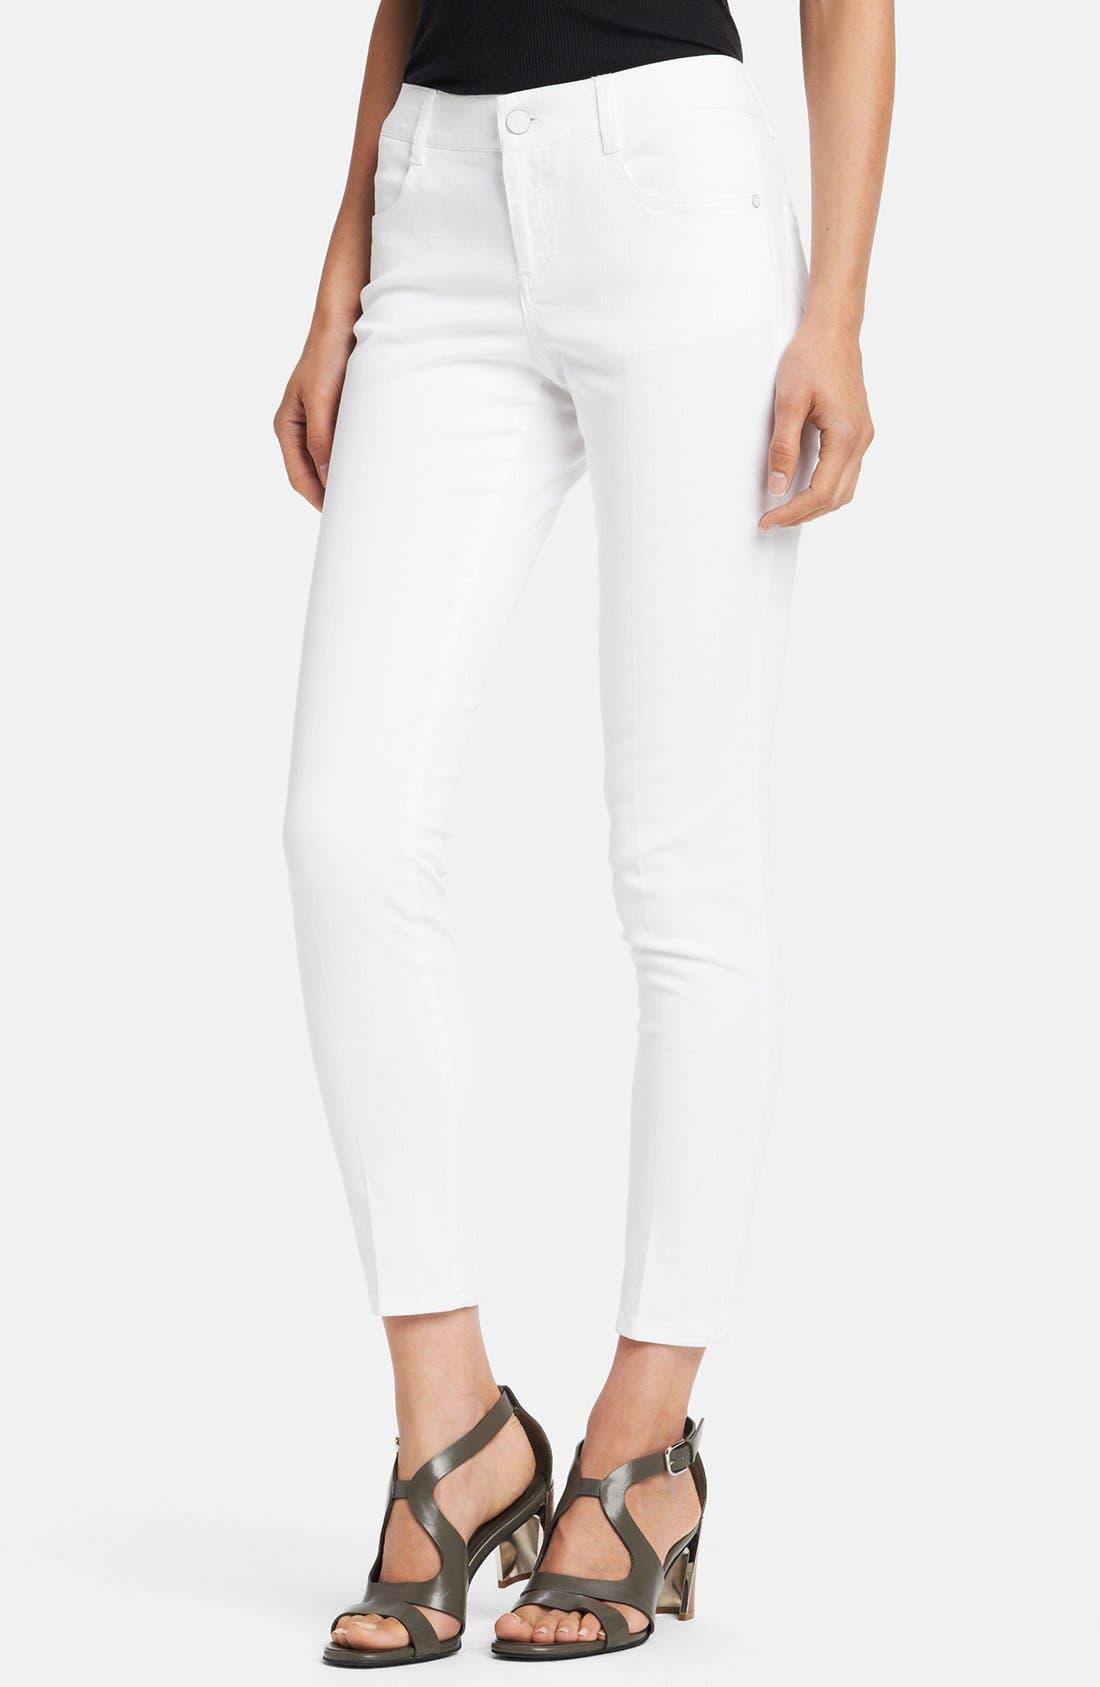 Alternate Image 1 Selected - Stella McCartney 'Simone' Skinny Ankle Grazer Jeans